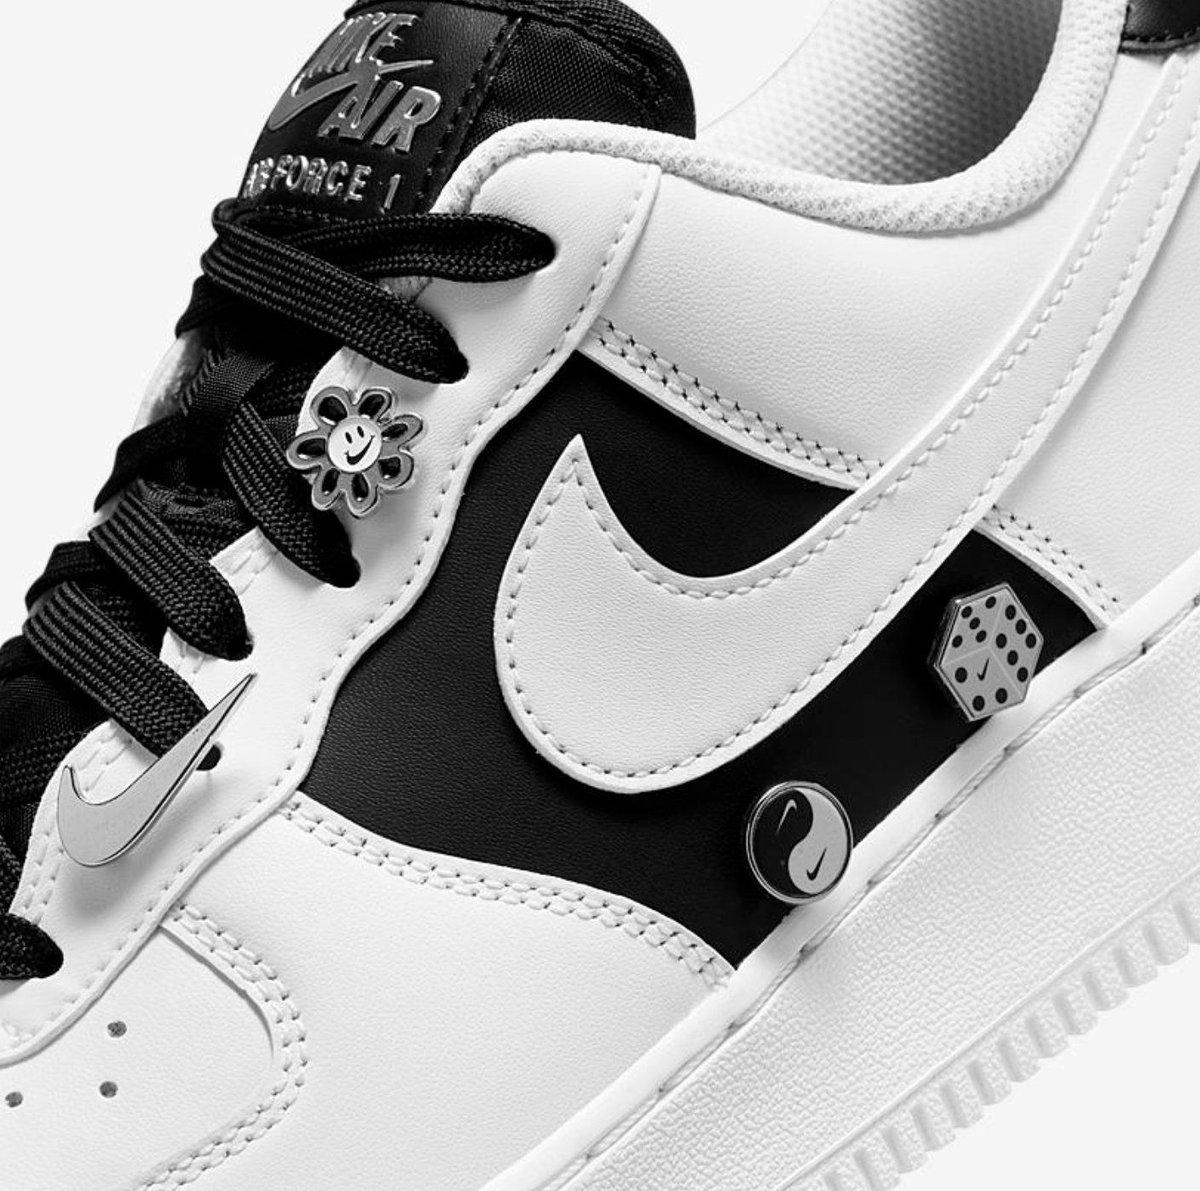 Available via Footlocker Nike Air Force 1 '07 PRM Silver Chain =